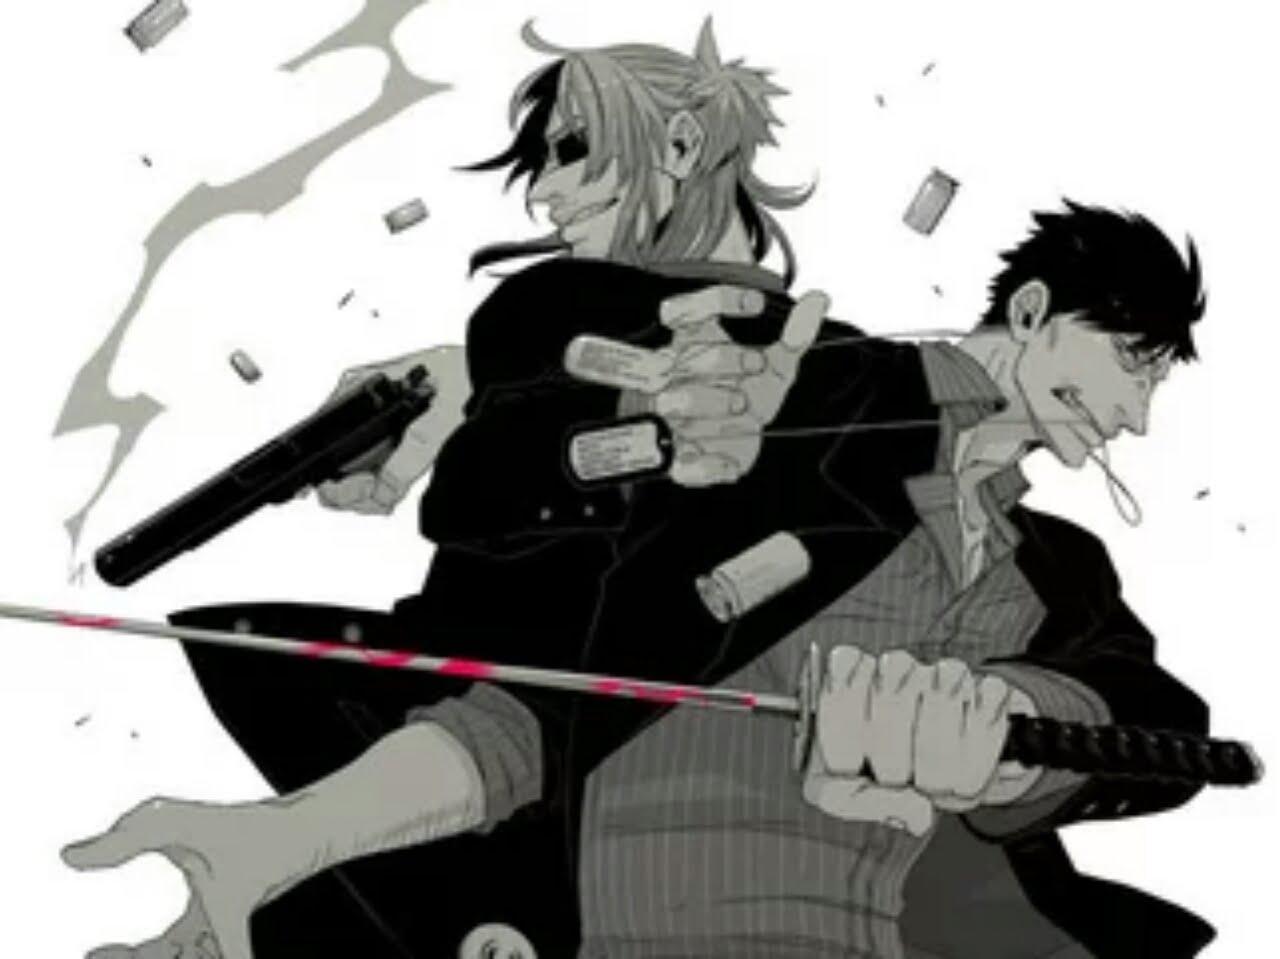 Kreator Manga Gangsta, Kohske, Didiagnosis Dengan Penyakit Autoimun 1